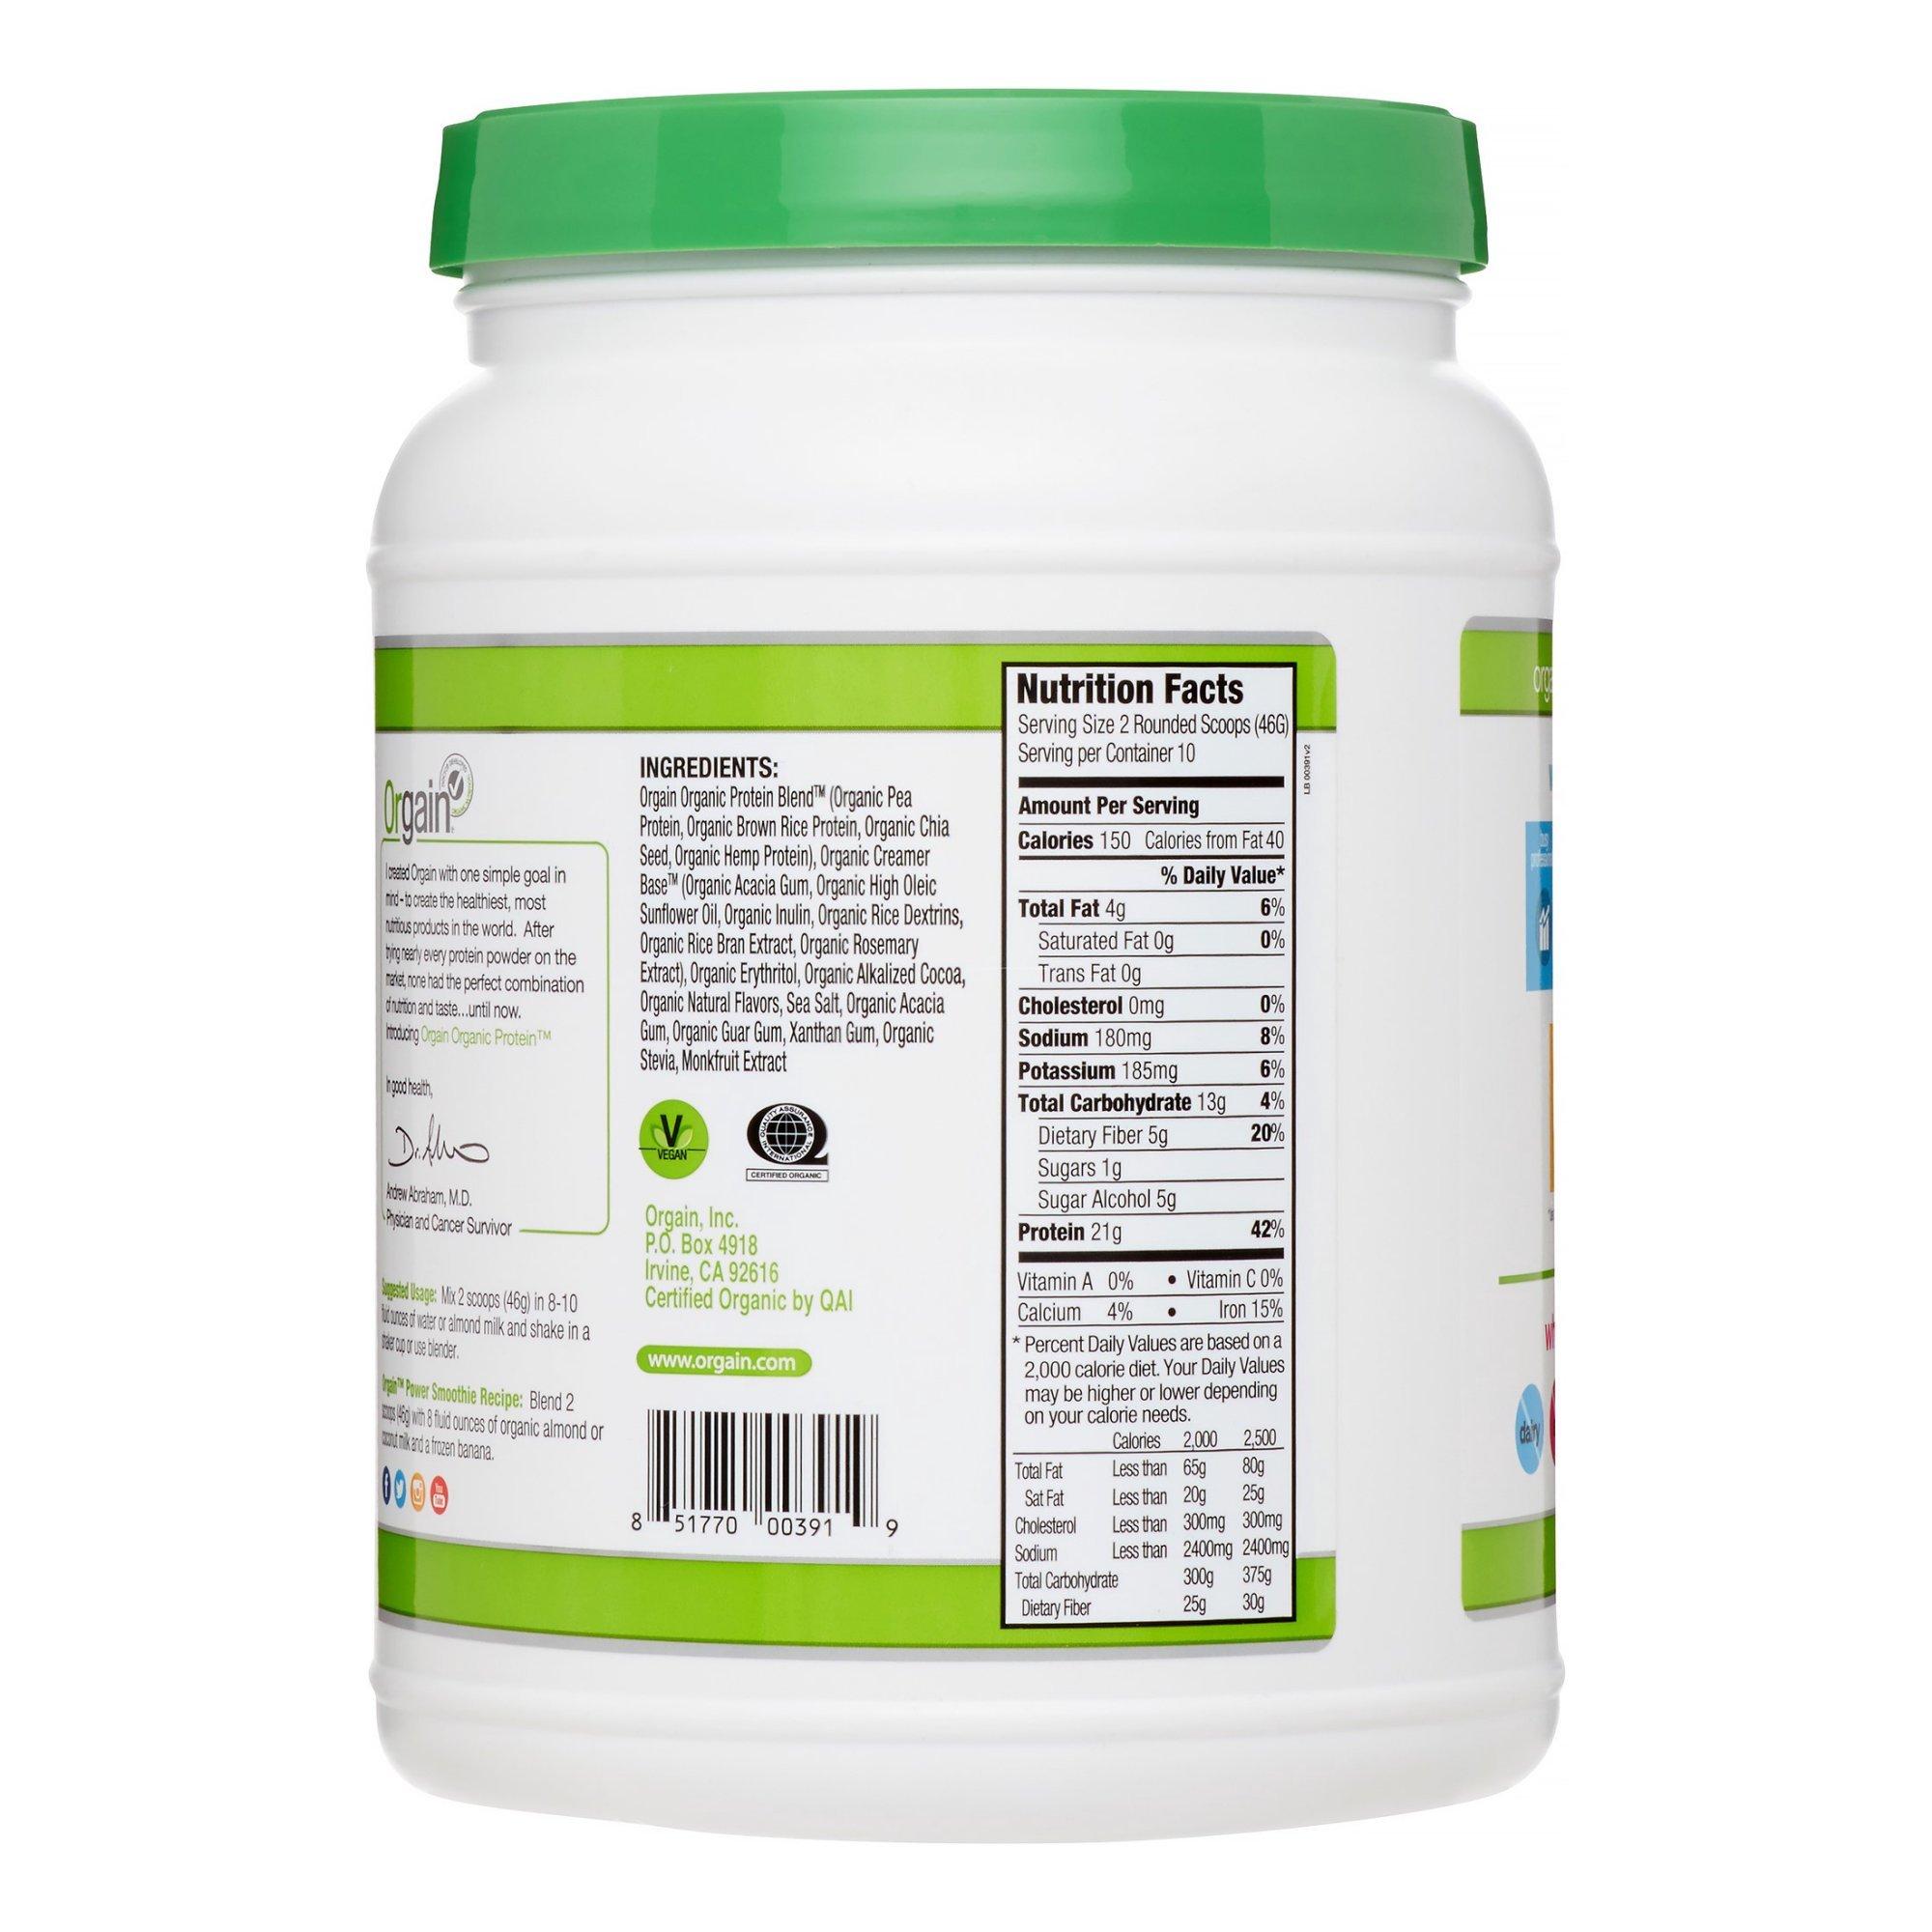 Orgain Organic Plant Based Protein Powder, Creamy Chocolate Fudge, 1.02 Pound, 4 Count